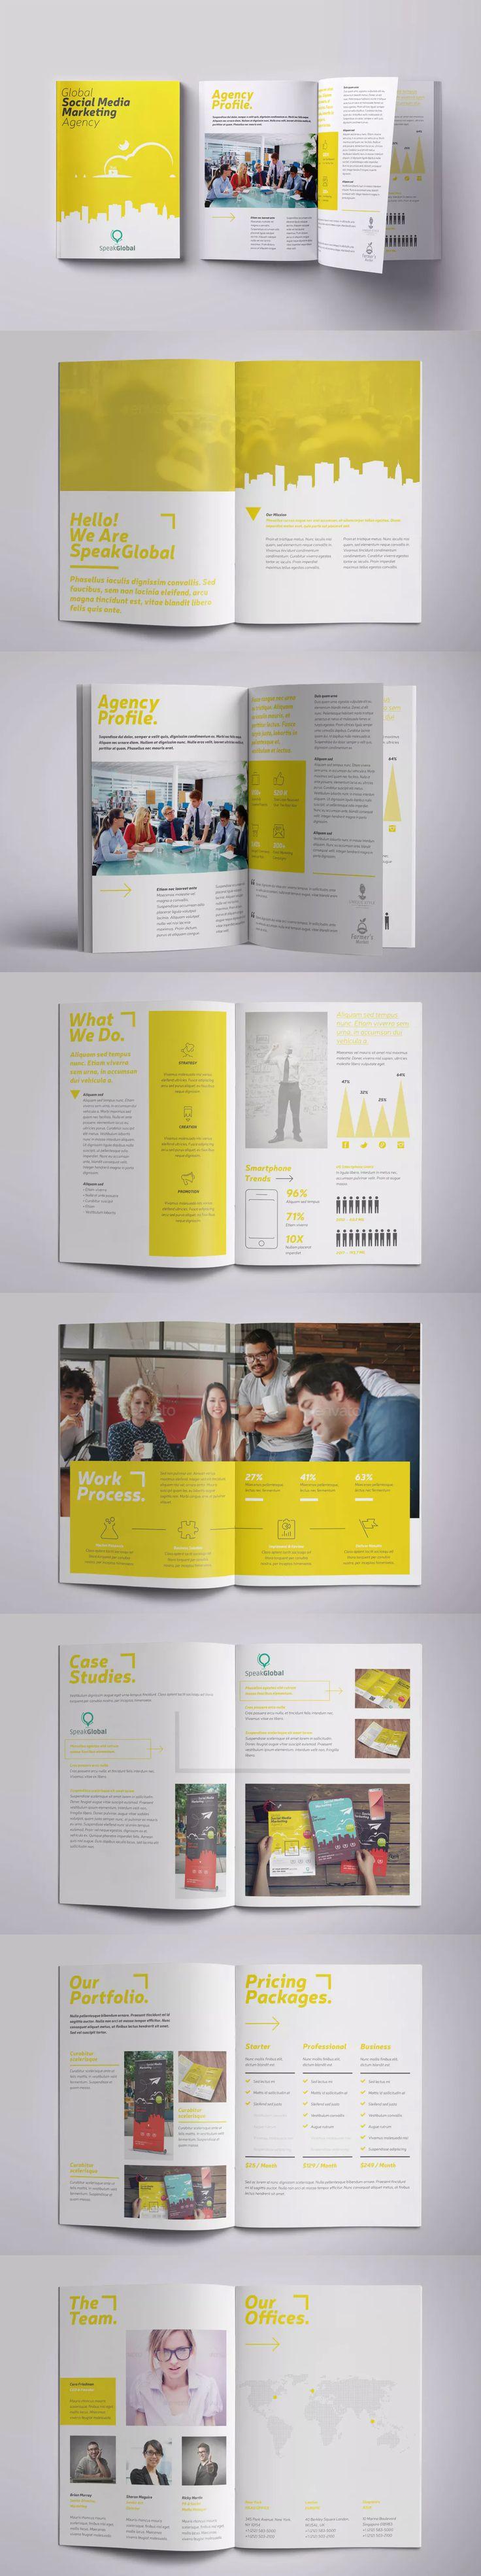 Social Media Brochure Template PSD, INDD - A4